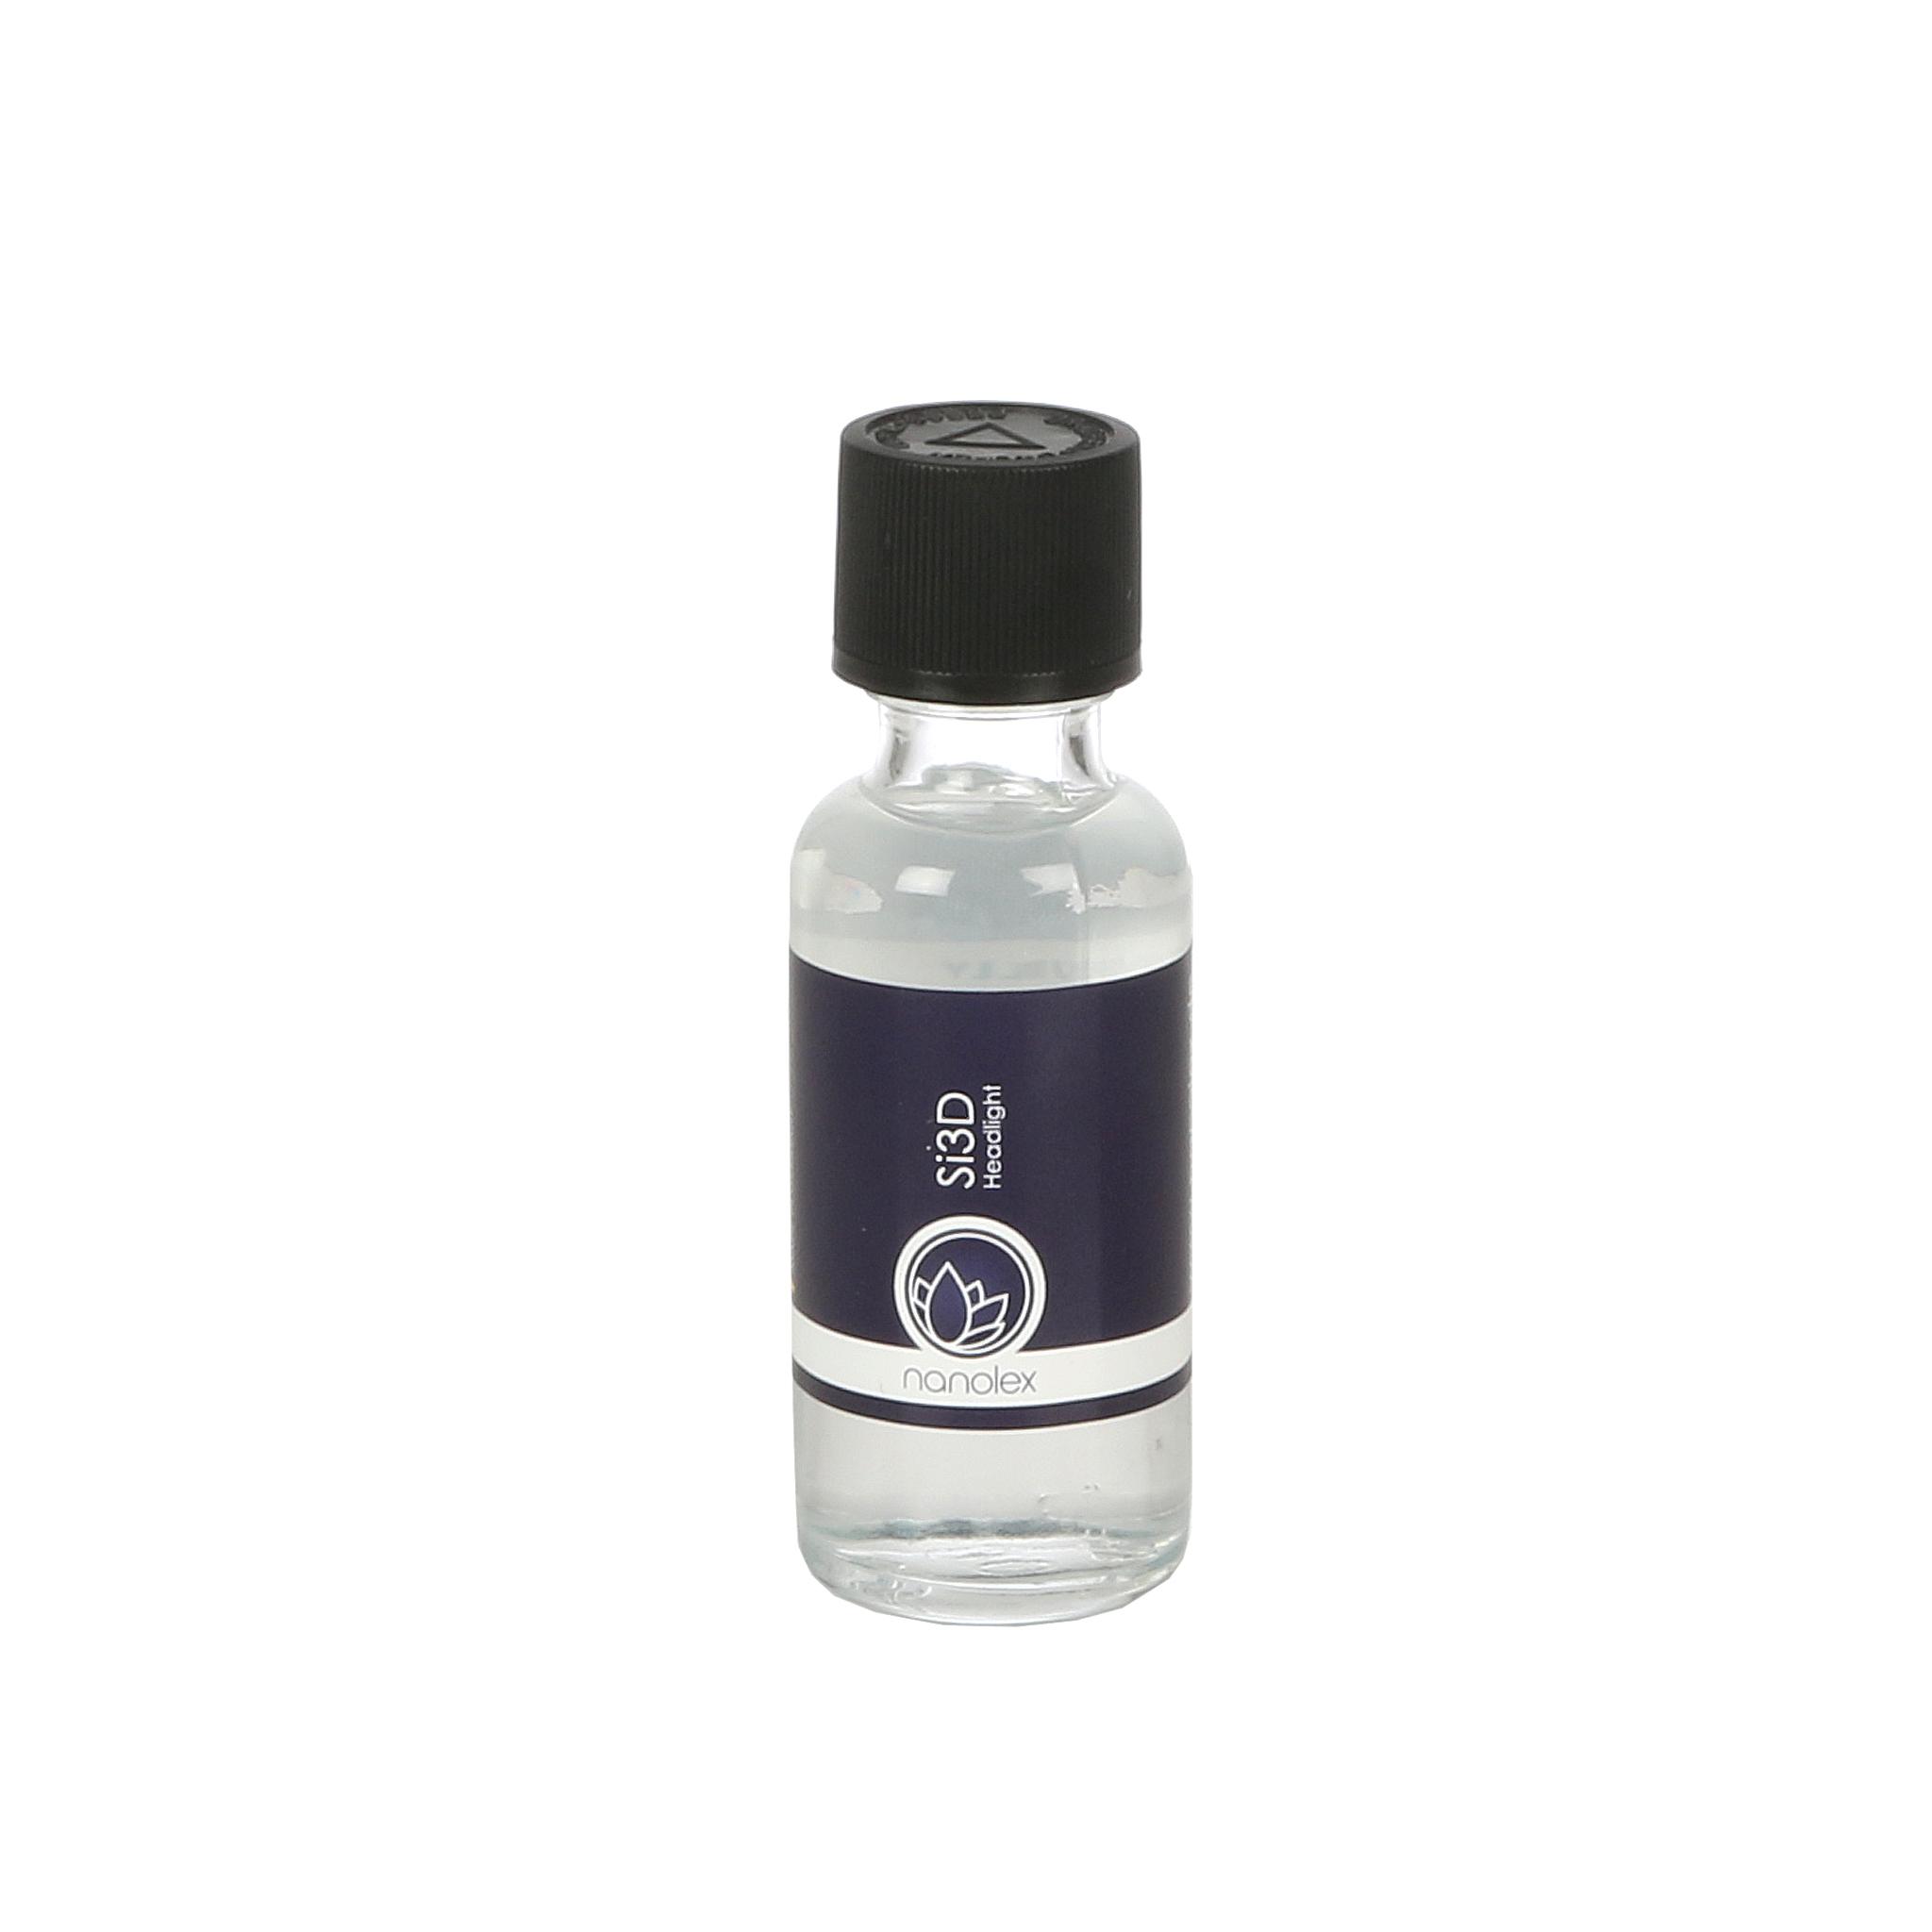 Akrylplastförsegling Nanolex Si3D Headlight, 30 ml